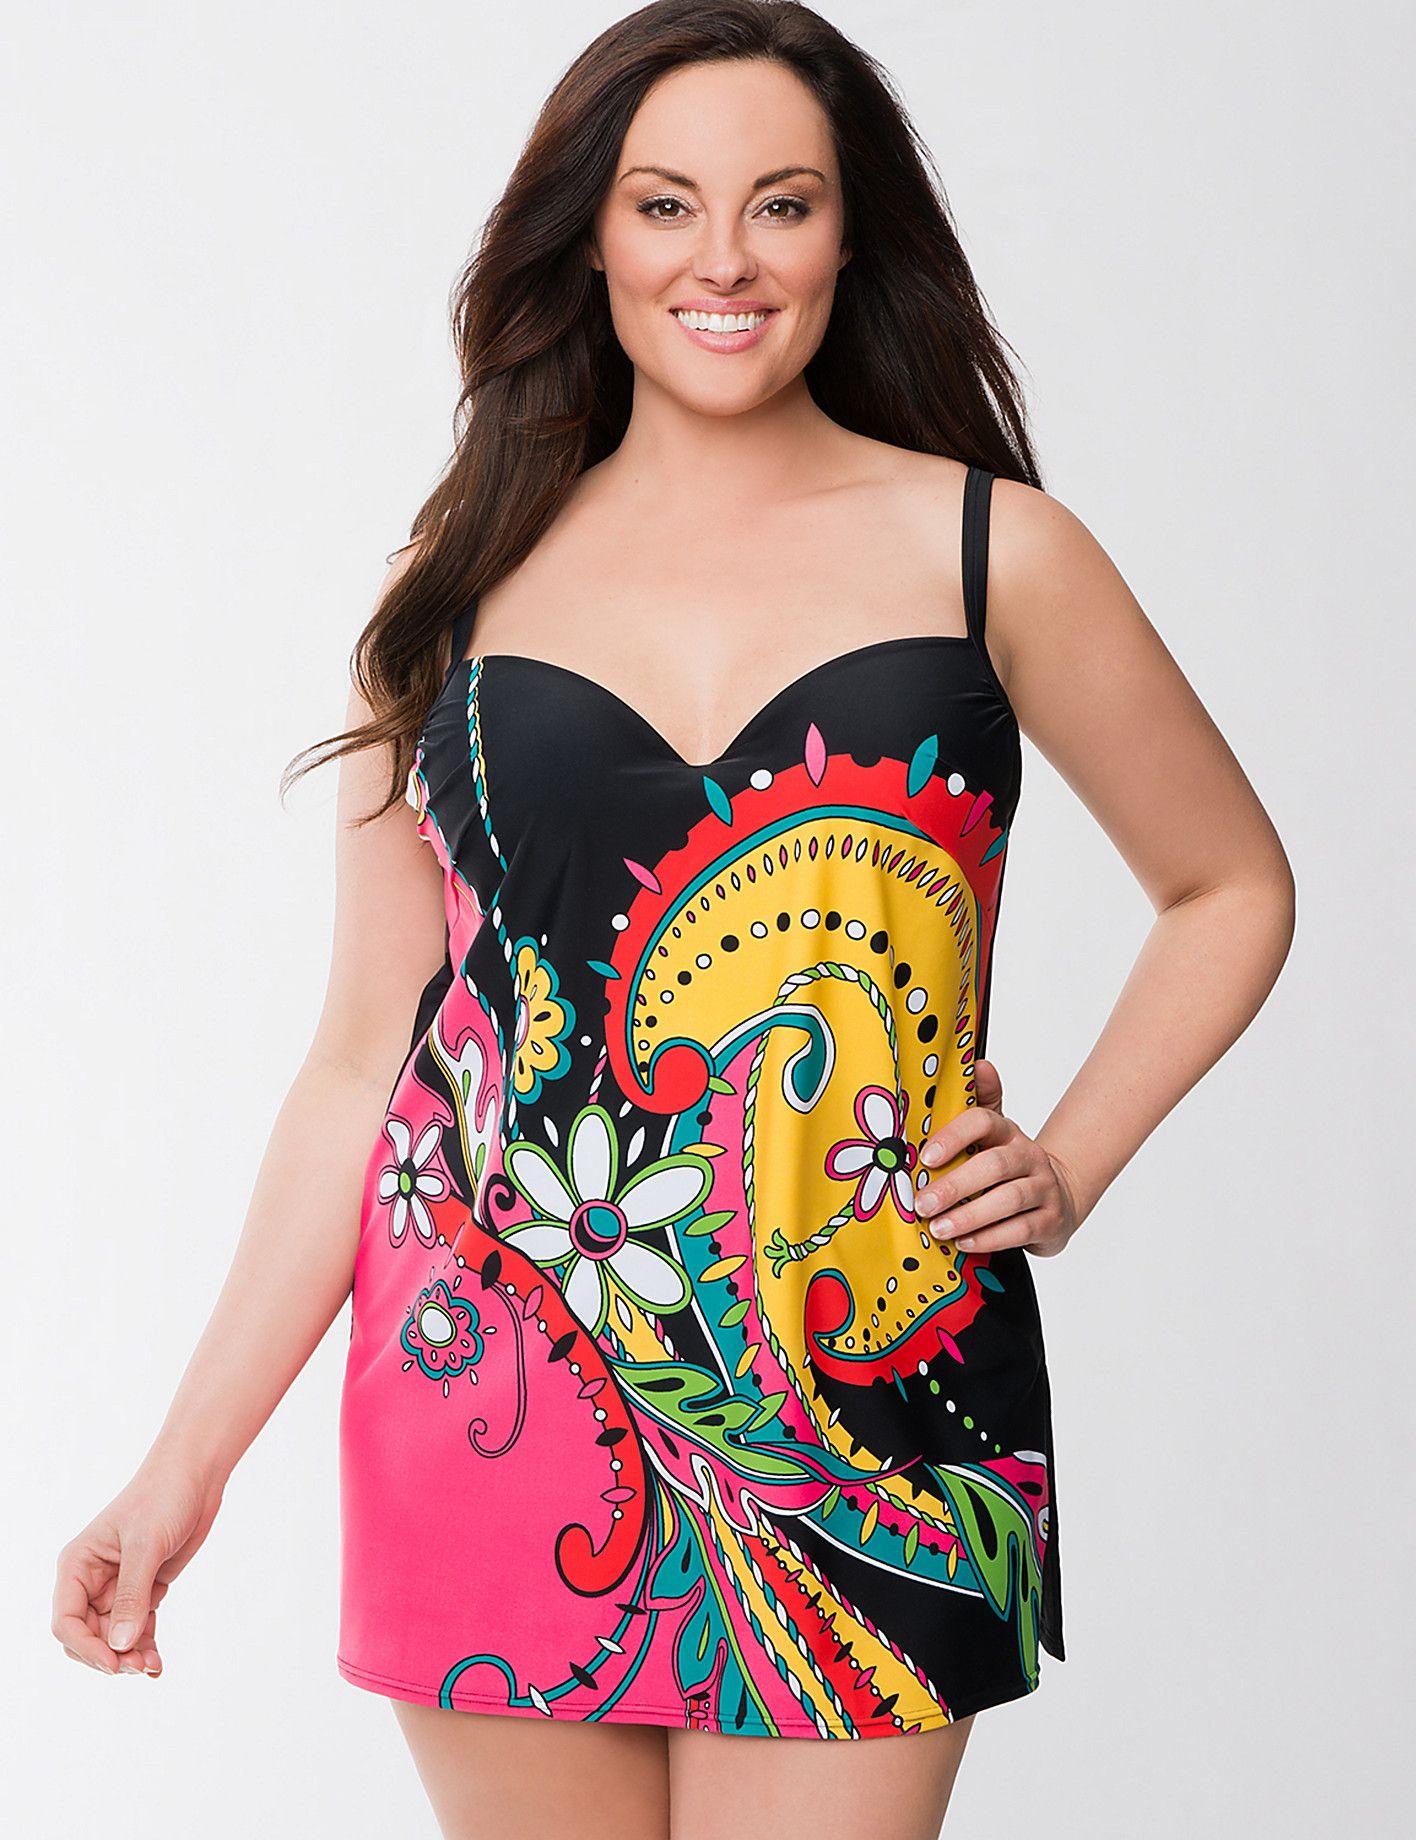 Swirl Print Swim Dress With Built In Bra Plus Size Fashion Fashion Clothes Women Swim Dress [ 1840 x 1416 Pixel ]